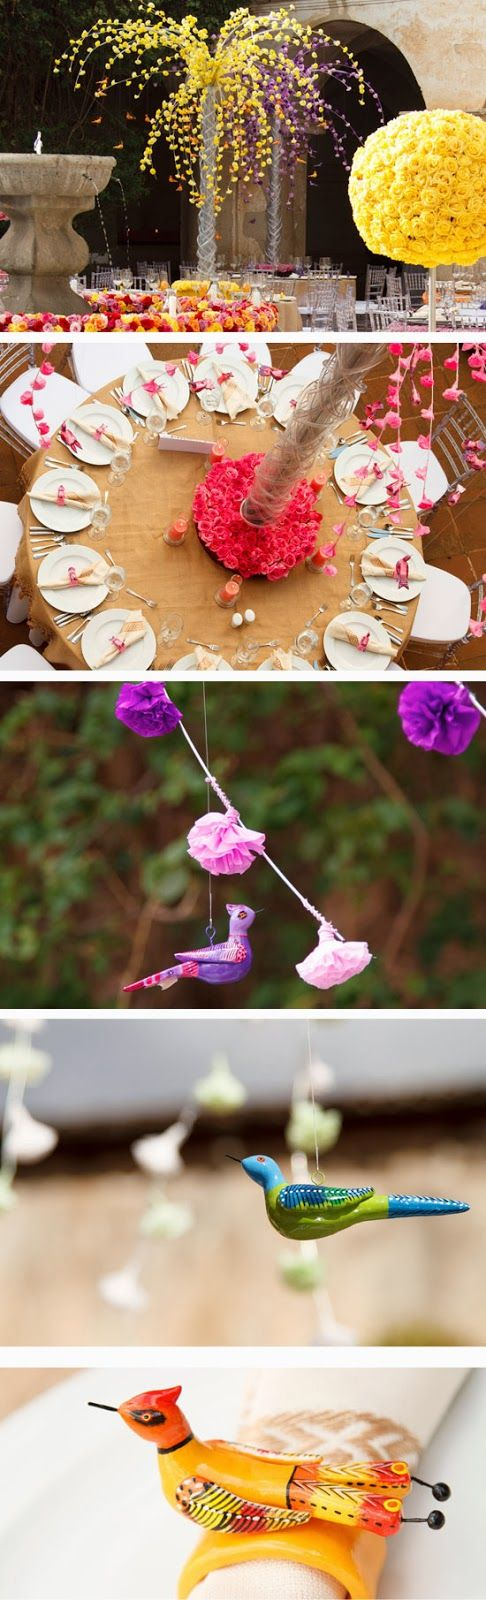 Pauline Lippmann Guatemalan Inspired Colorful Wedding in Guatemala